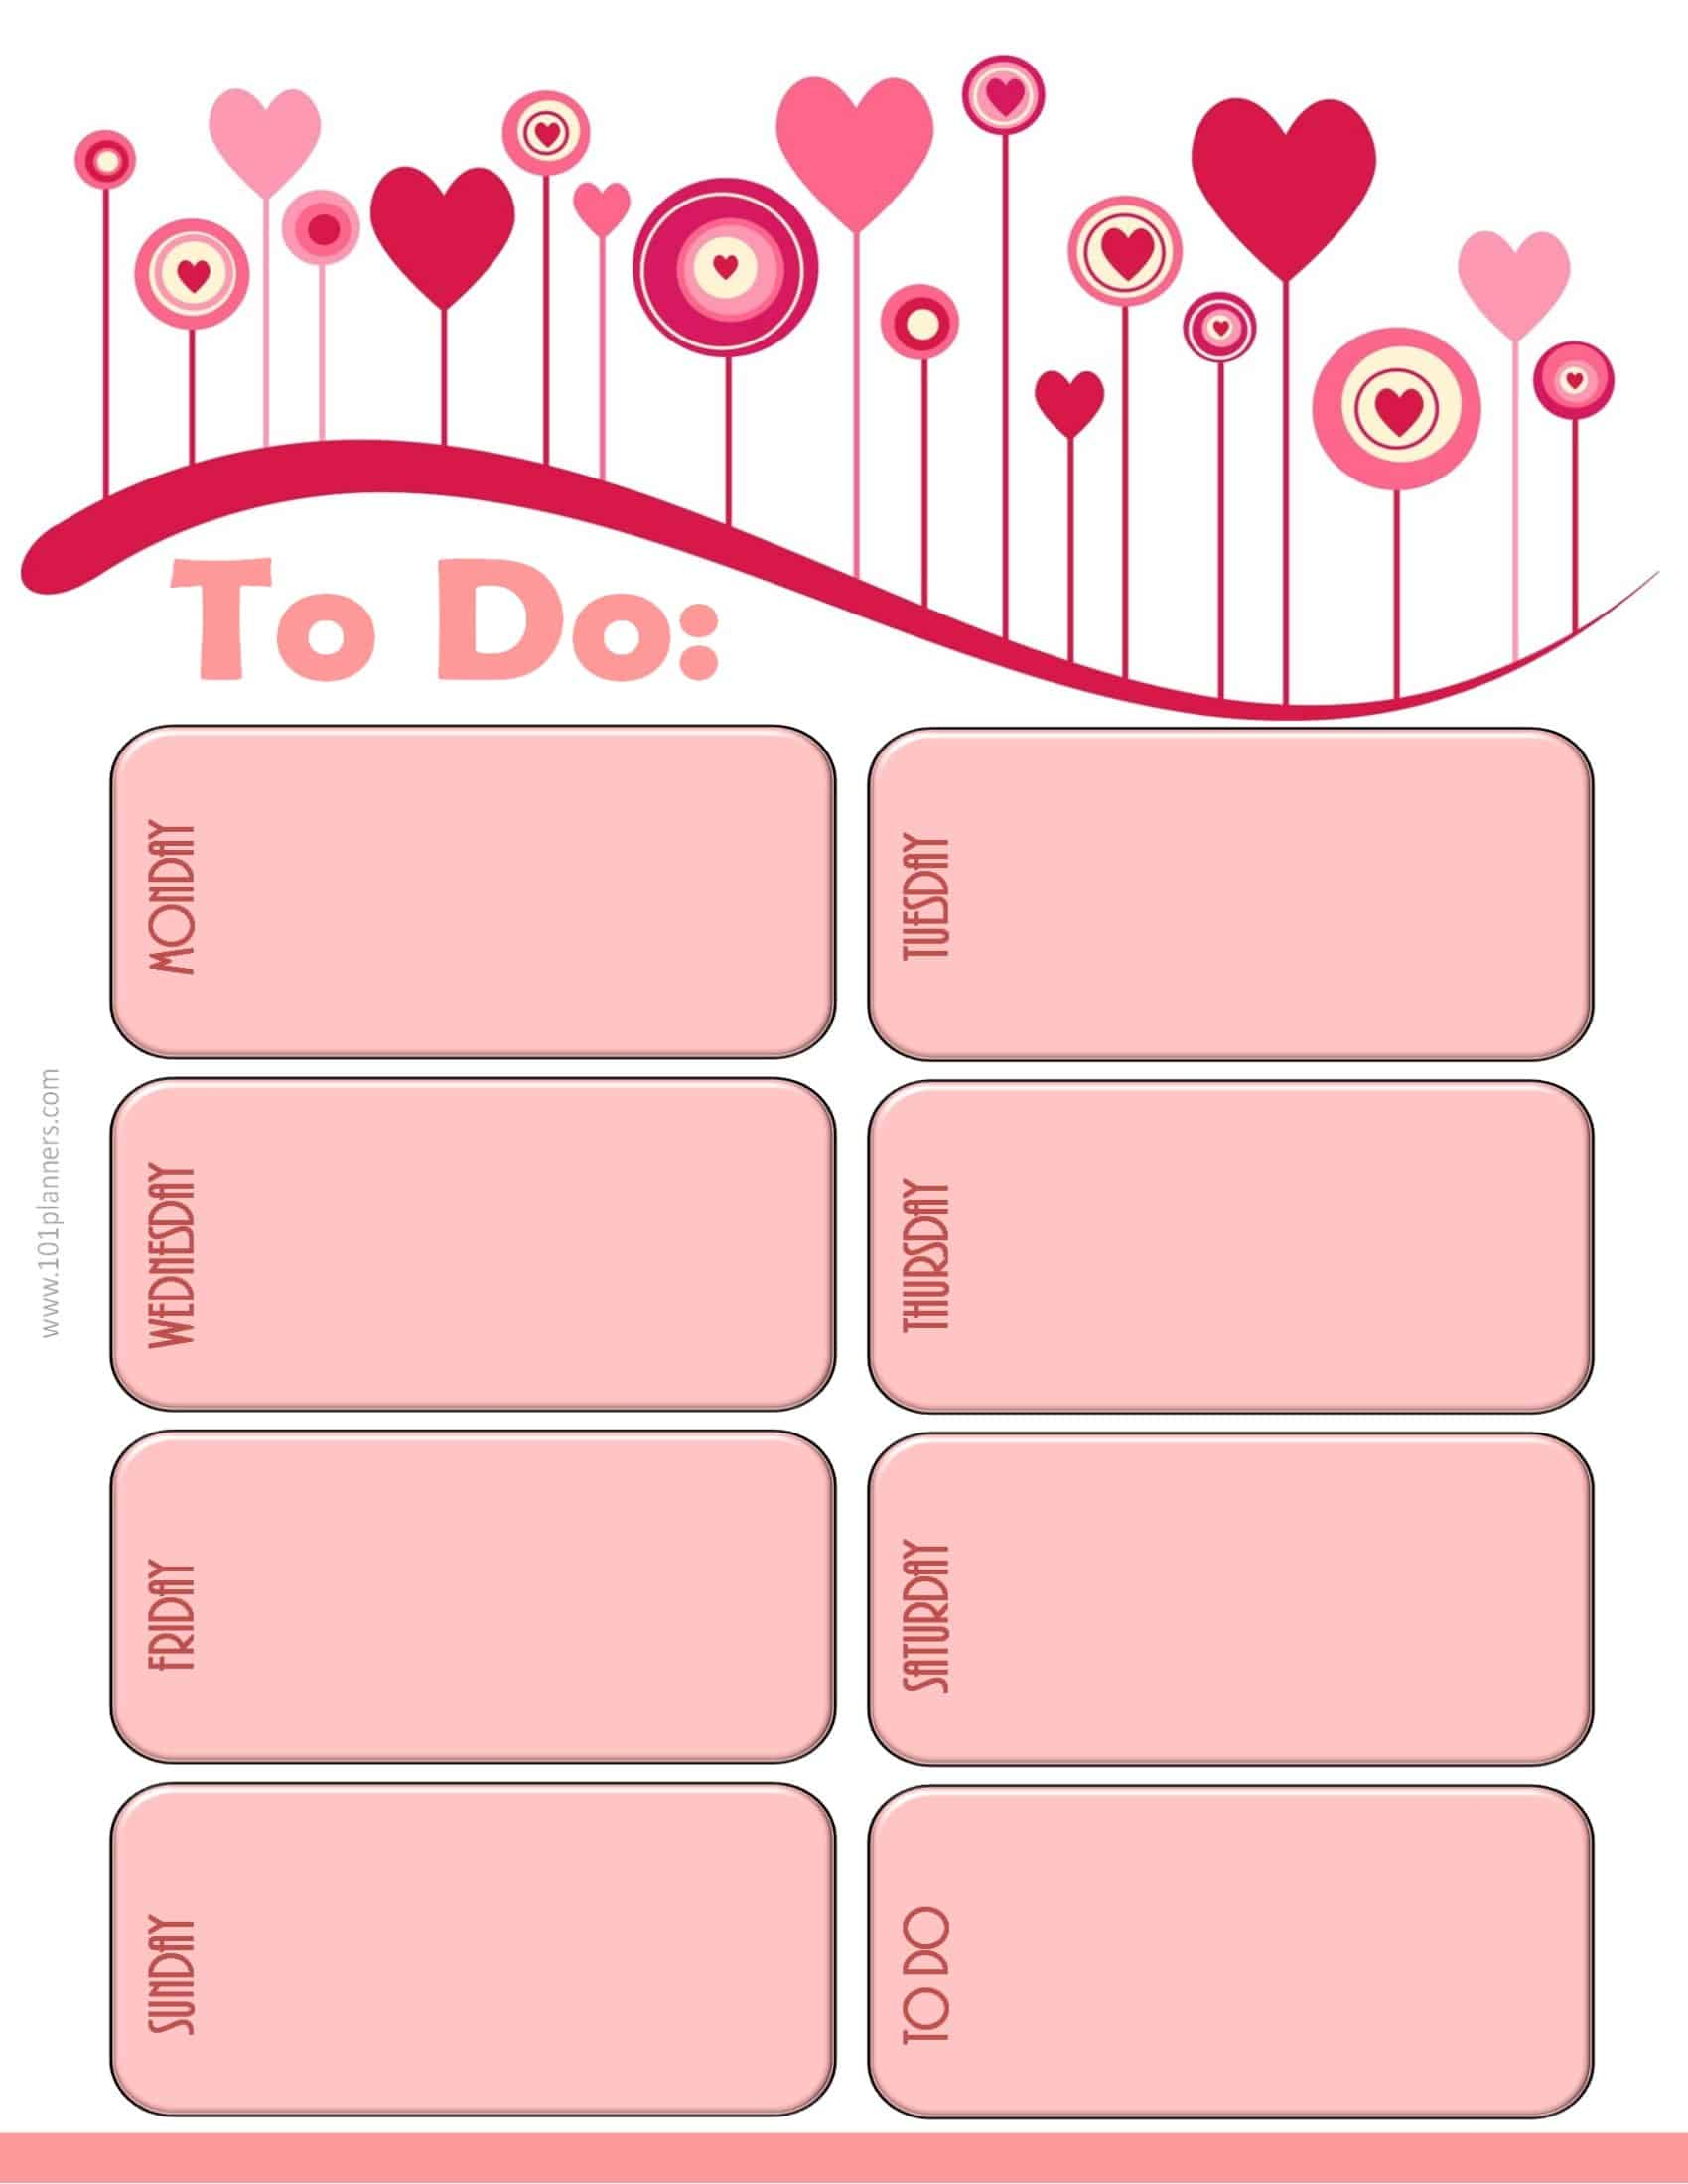 Weekly Calendar Maker | Create Free Custom Calendars within Cute Blank Day Calender Templates